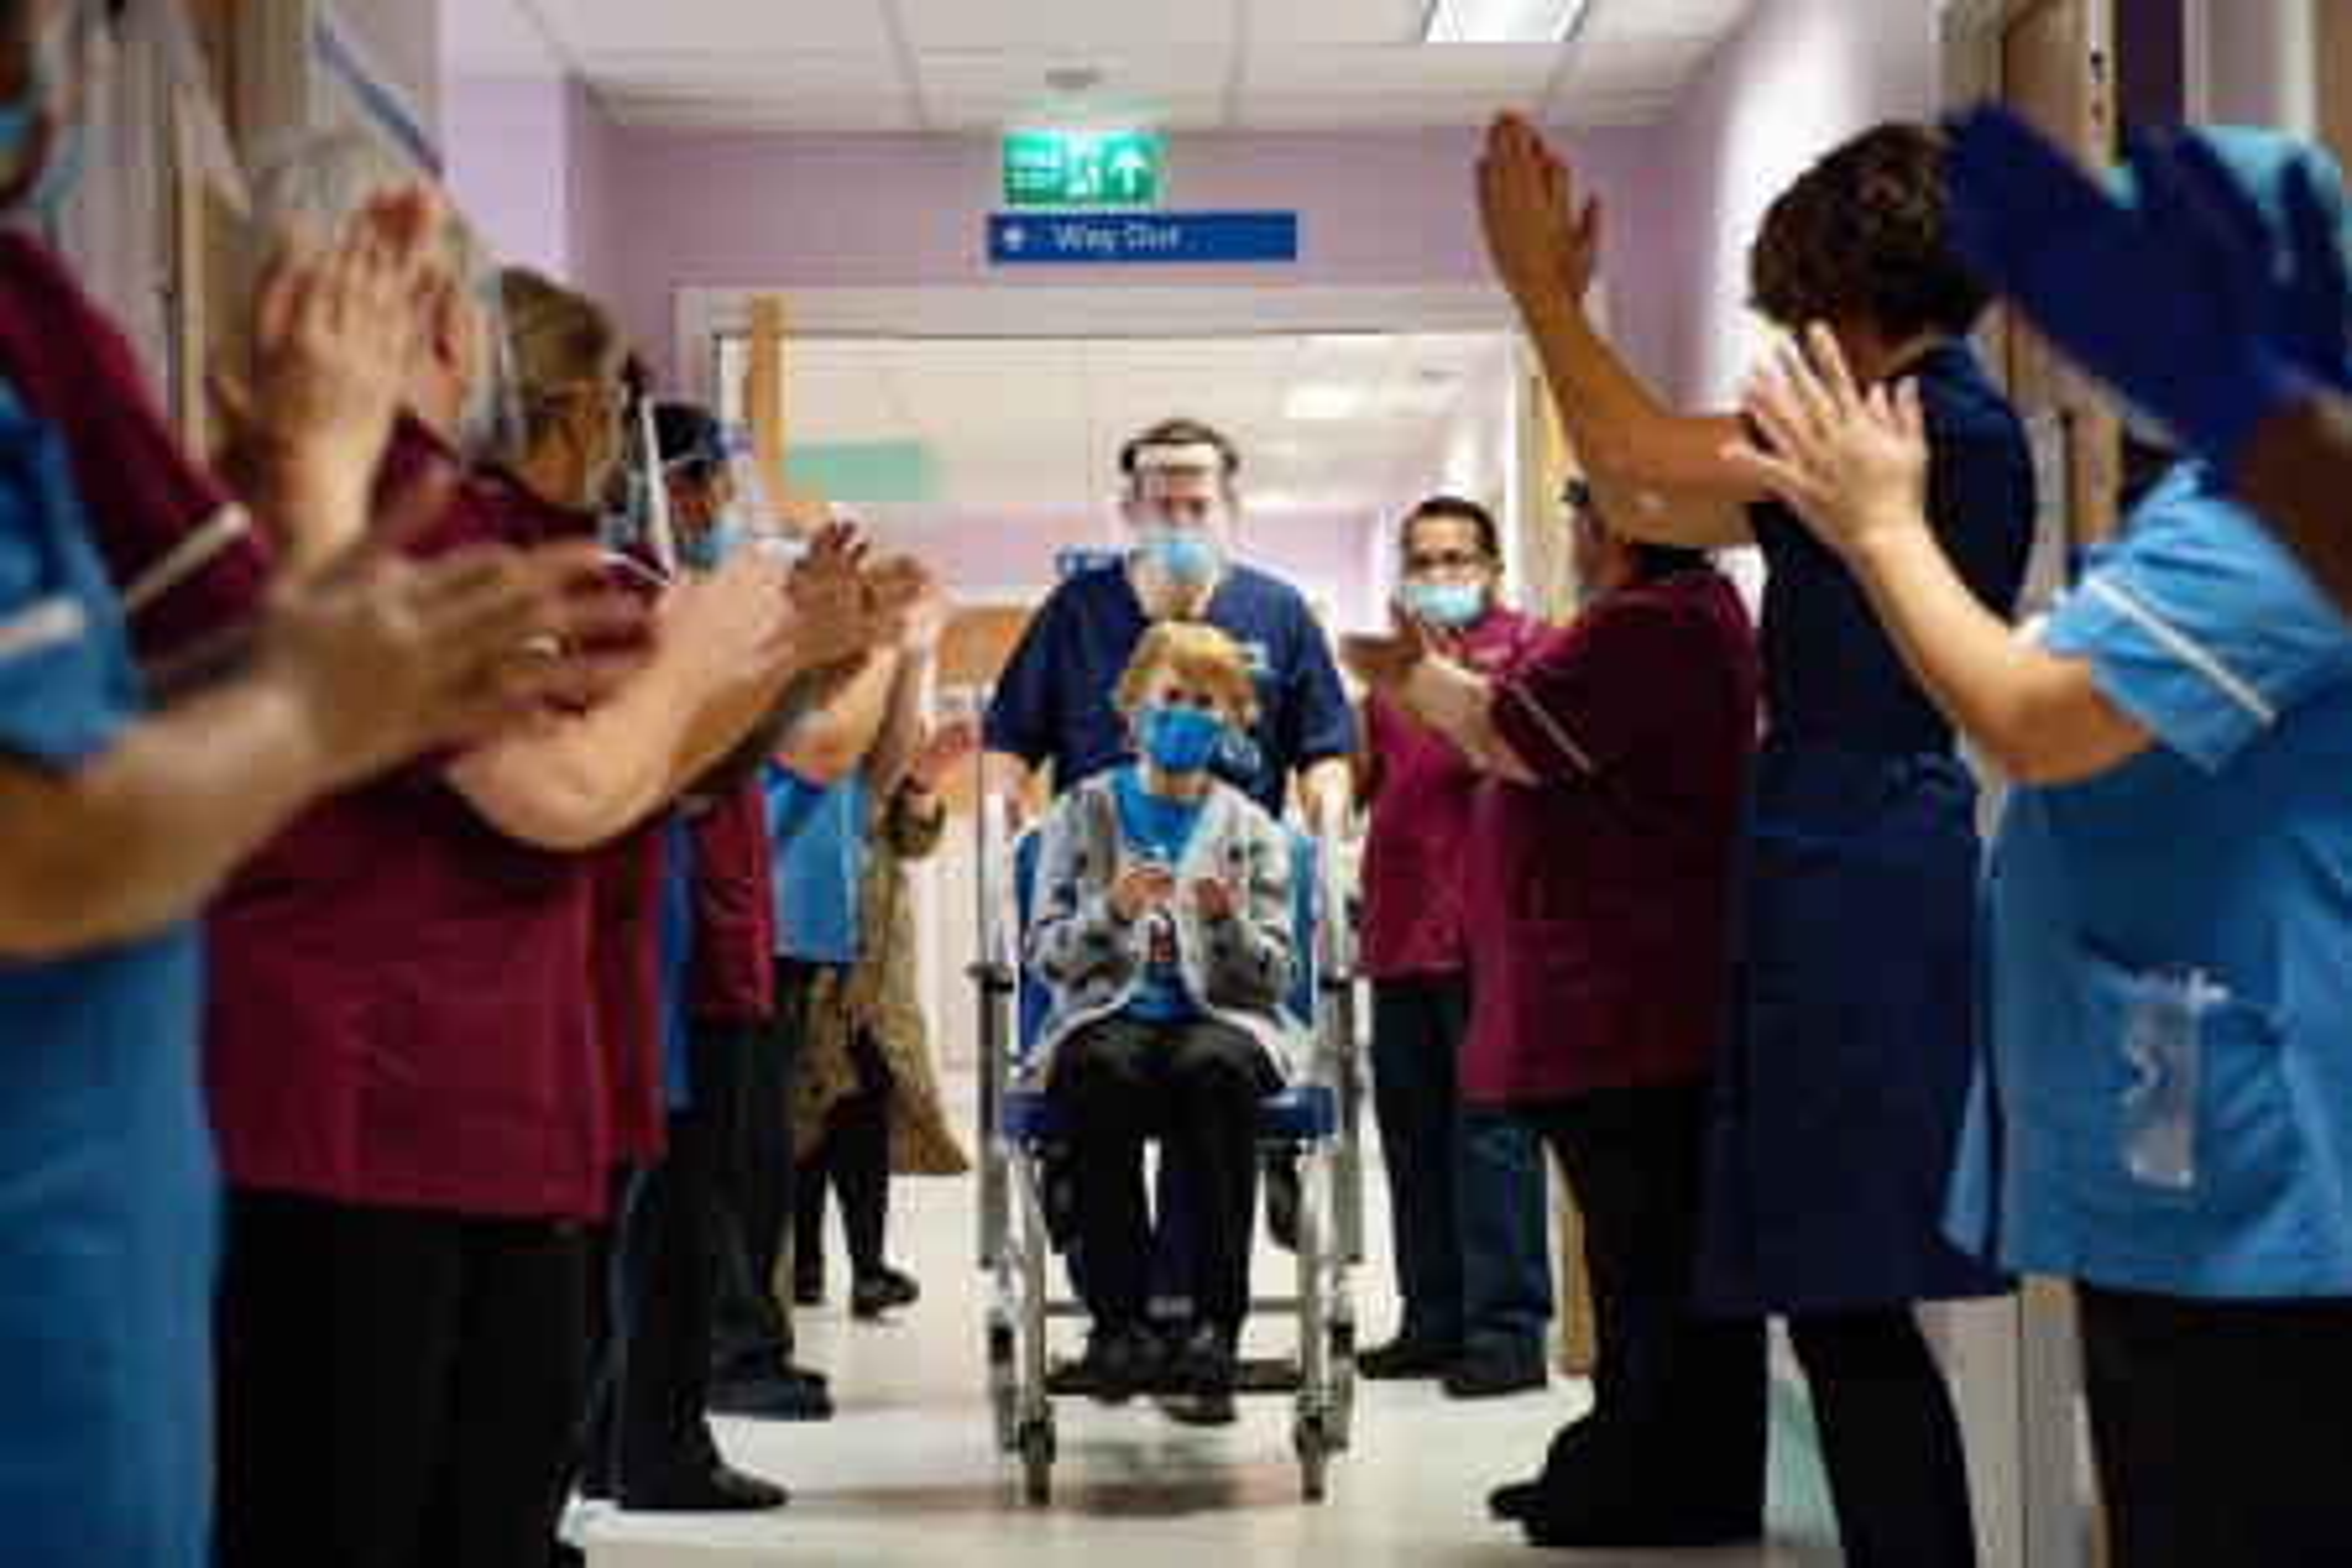 Staff applauds Margaret Keenan on her wheelchair